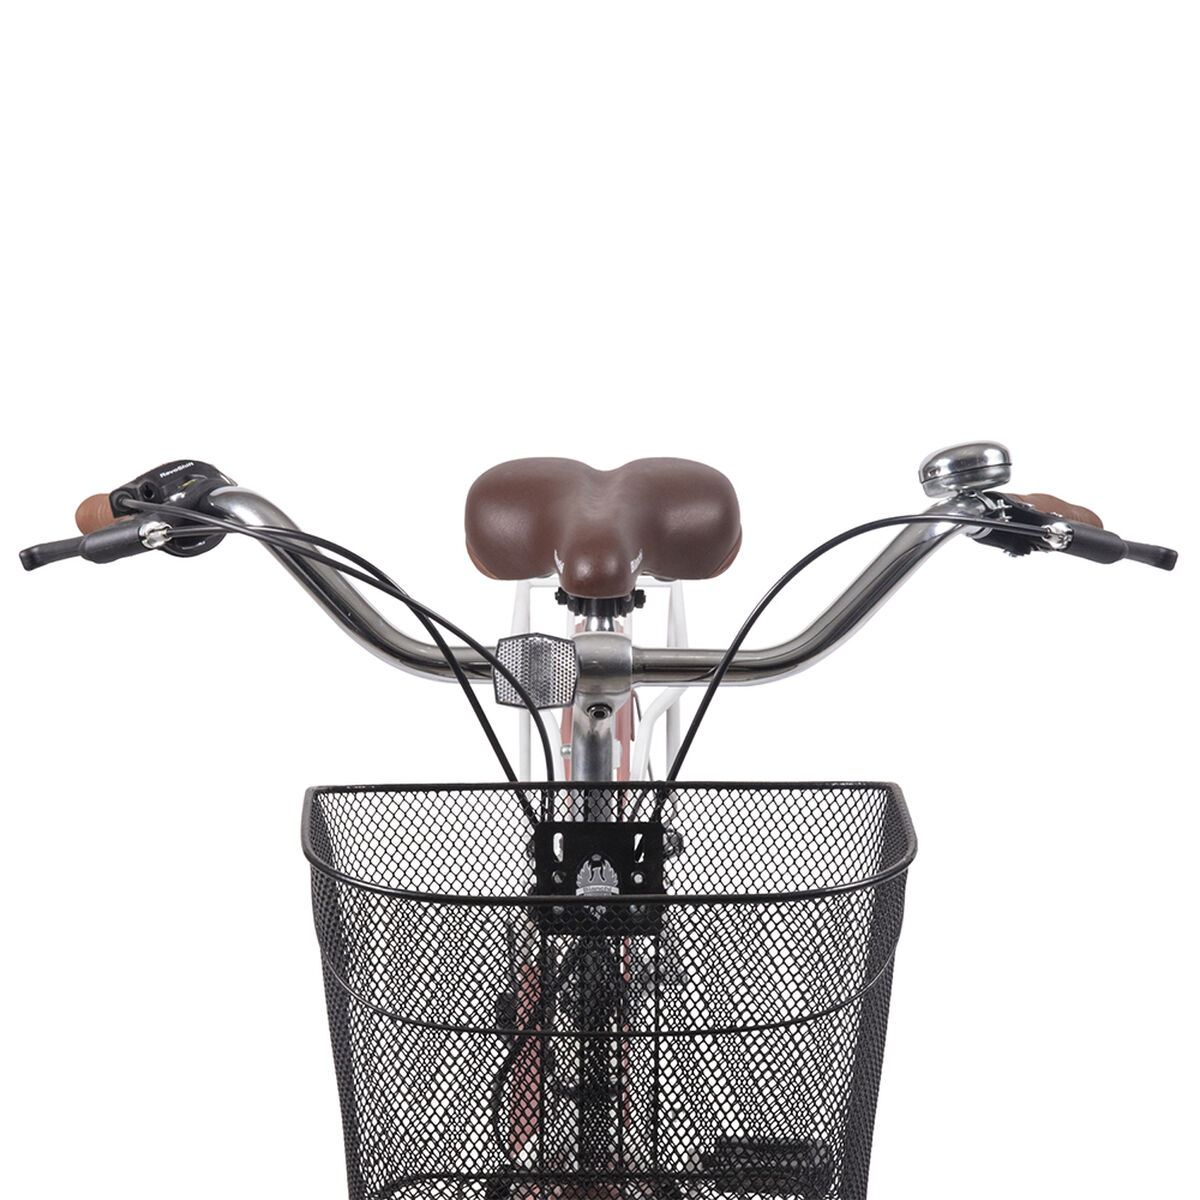 Bicicleta de Paseo Bianchi Street 24 Aro 24